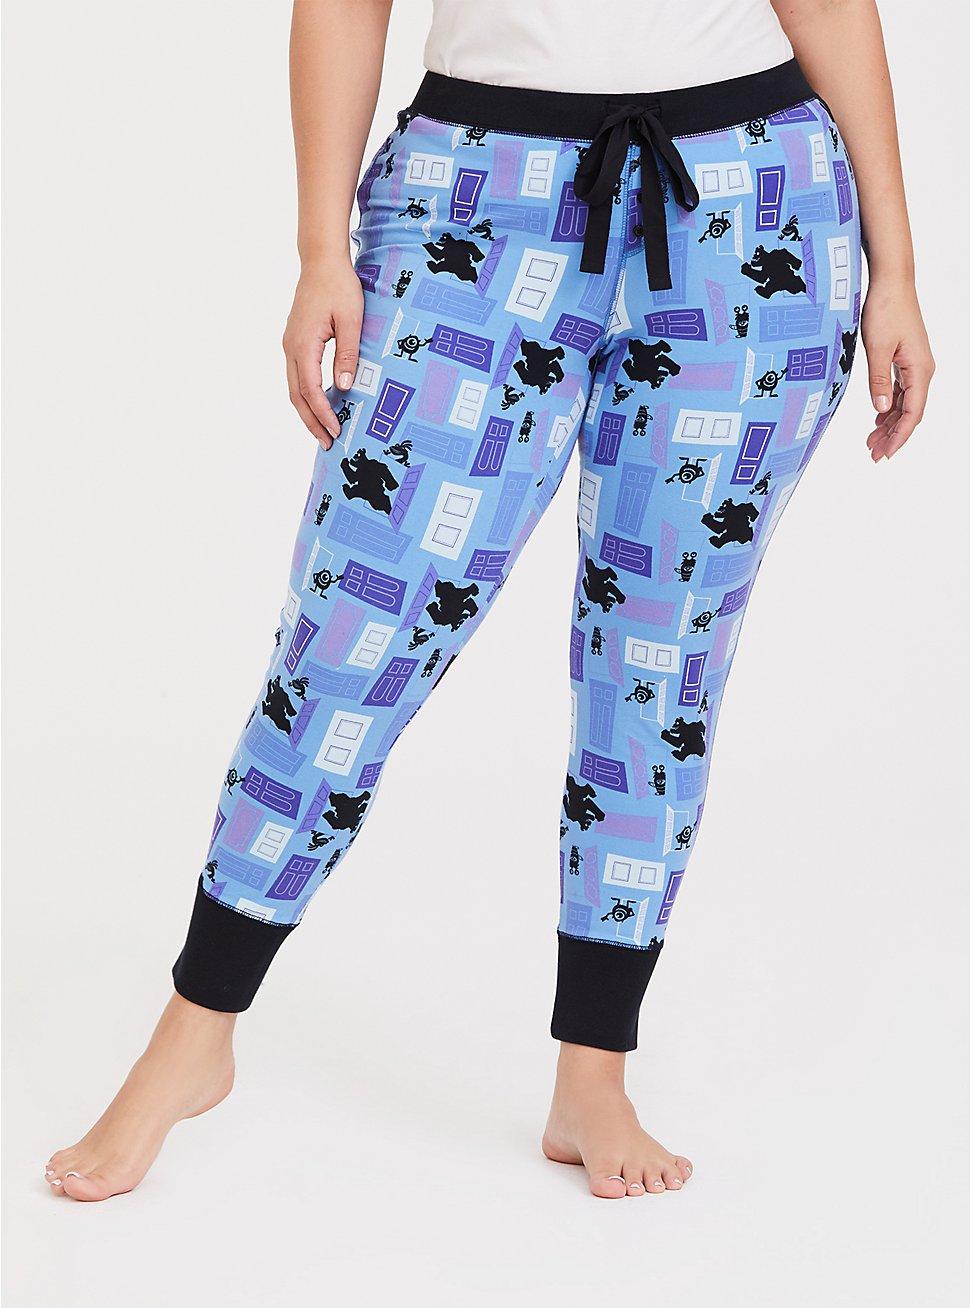 Disney Pixar Monster's, Inc. Print Blue Sleep Pant, BLUE, hi-res